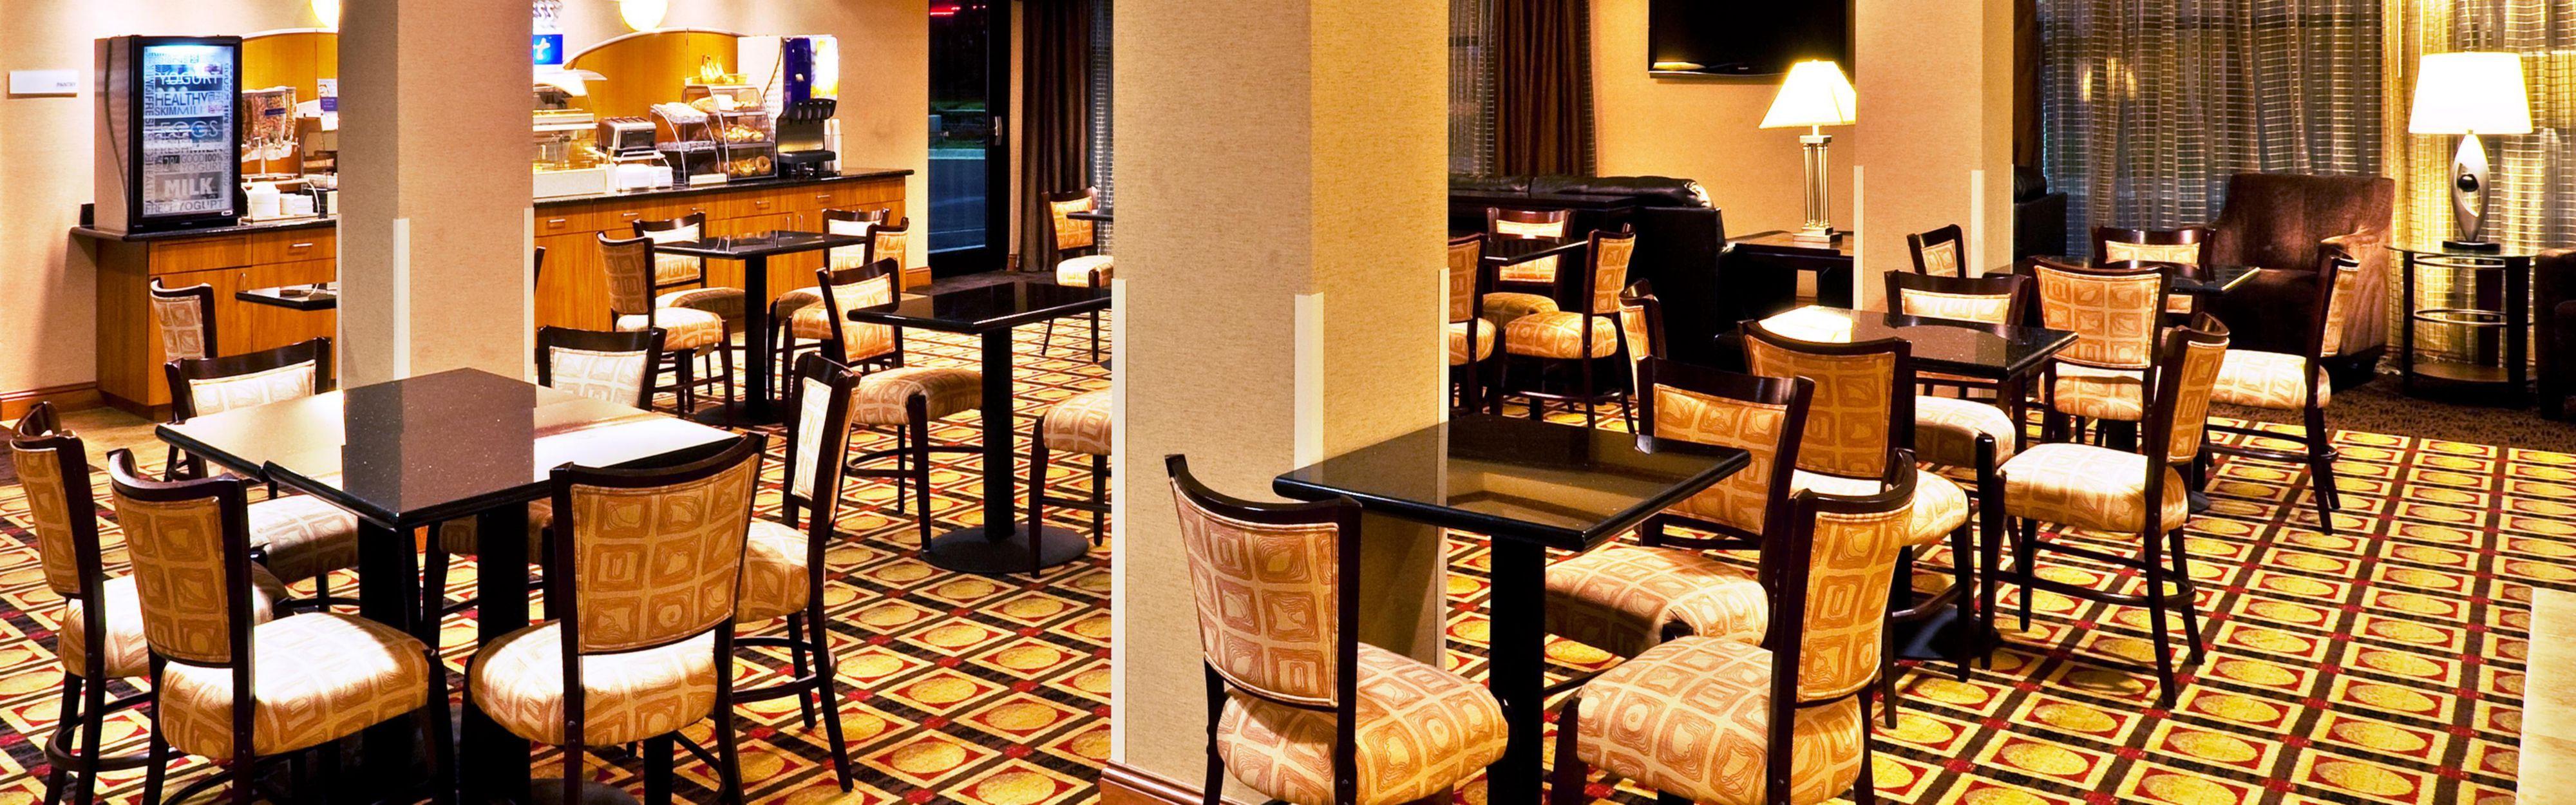 Holiday Inn Express & Suites Bartlesville image 2